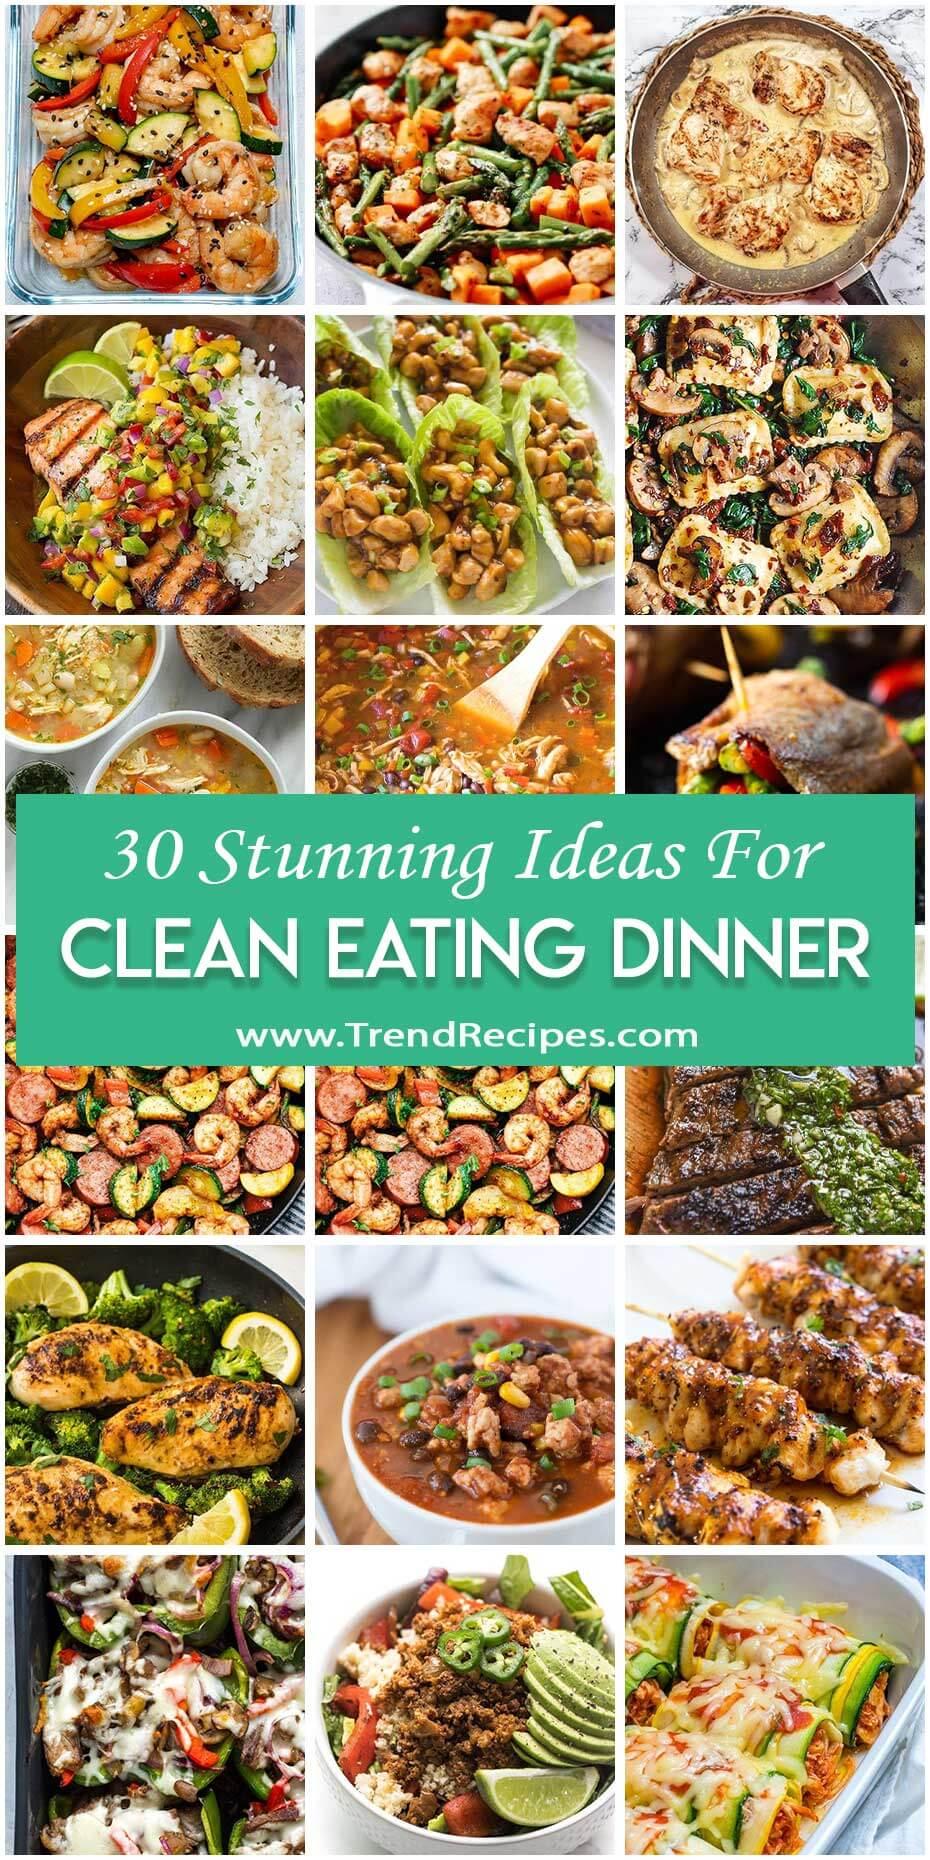 30 Stunning Dinner Ideas for Clean Eating Diet